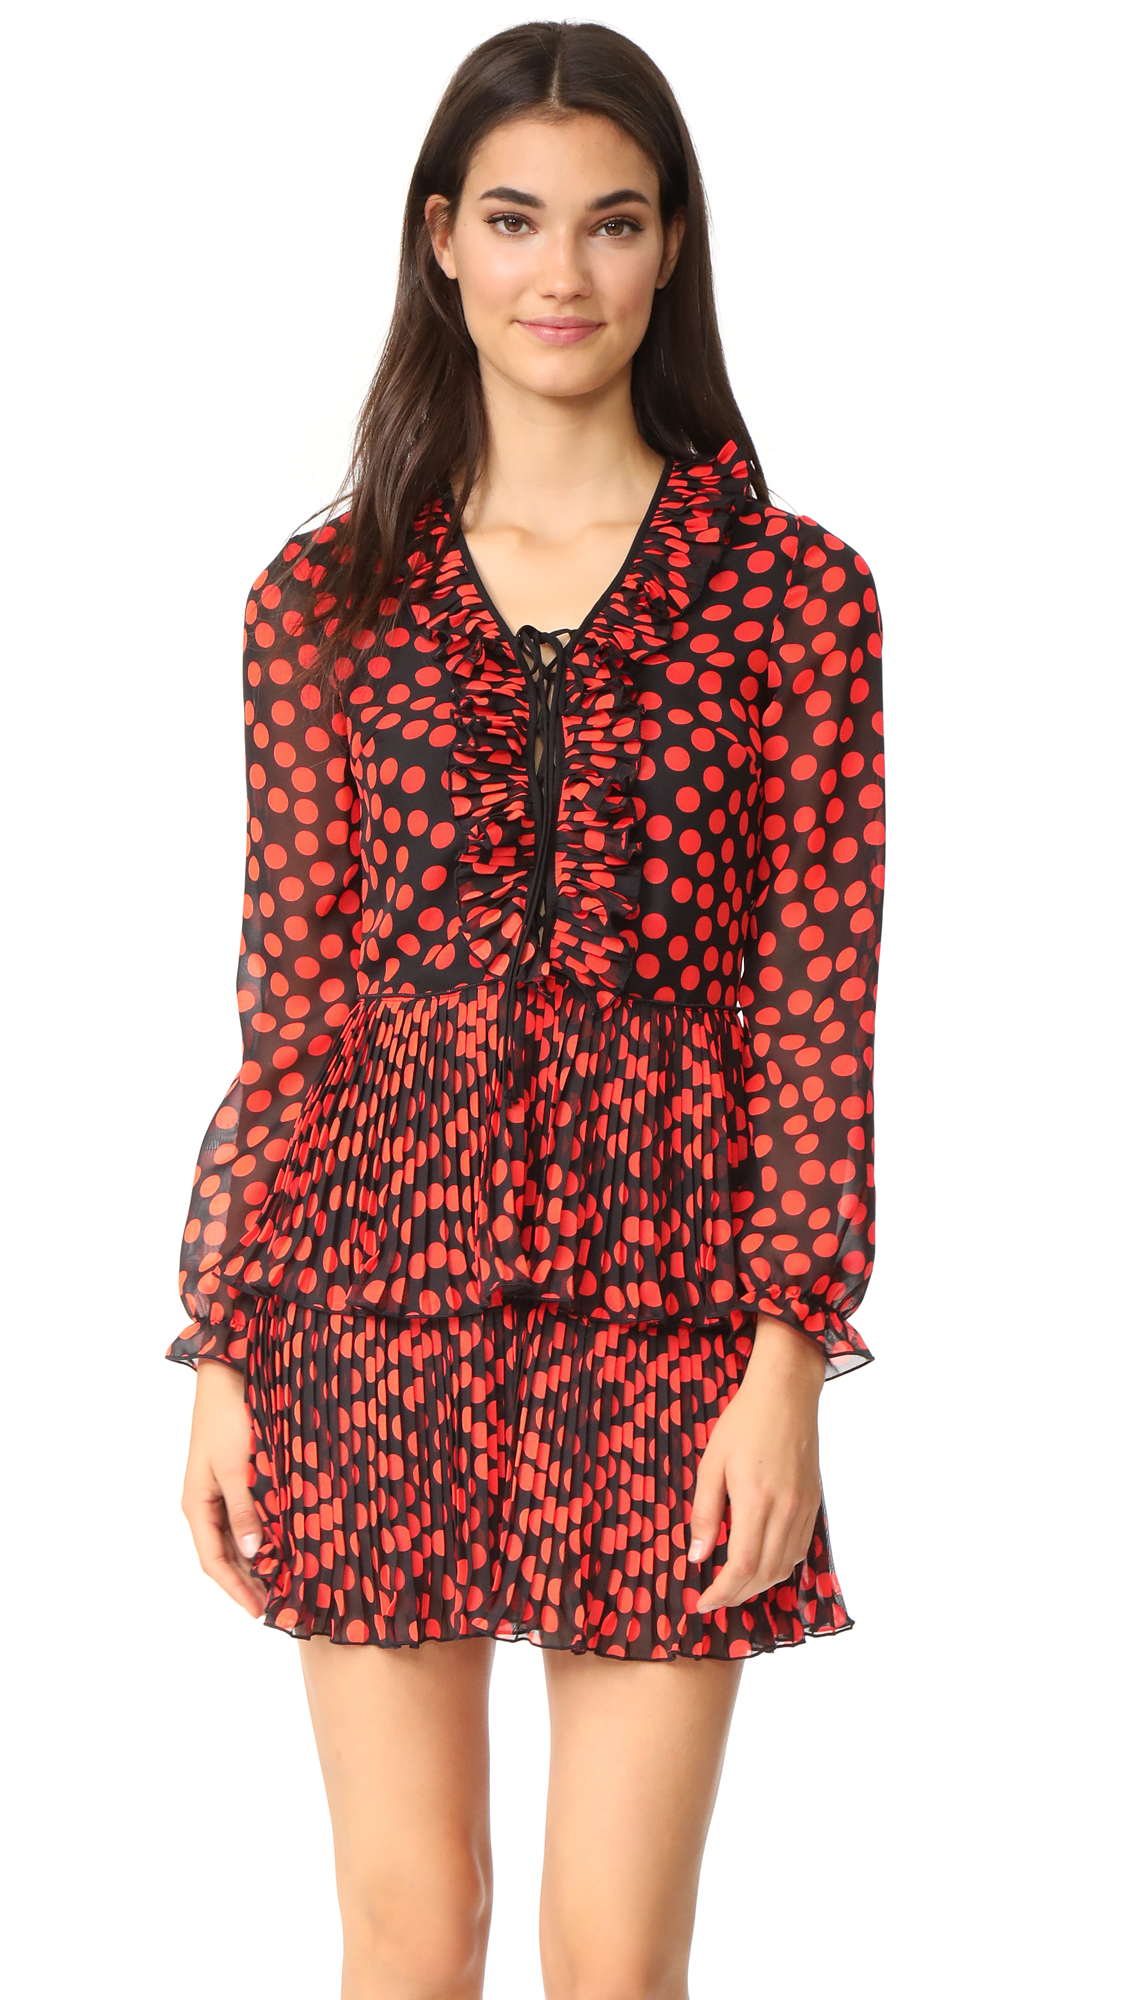 DELFI Collective Kiki Dress - Multi